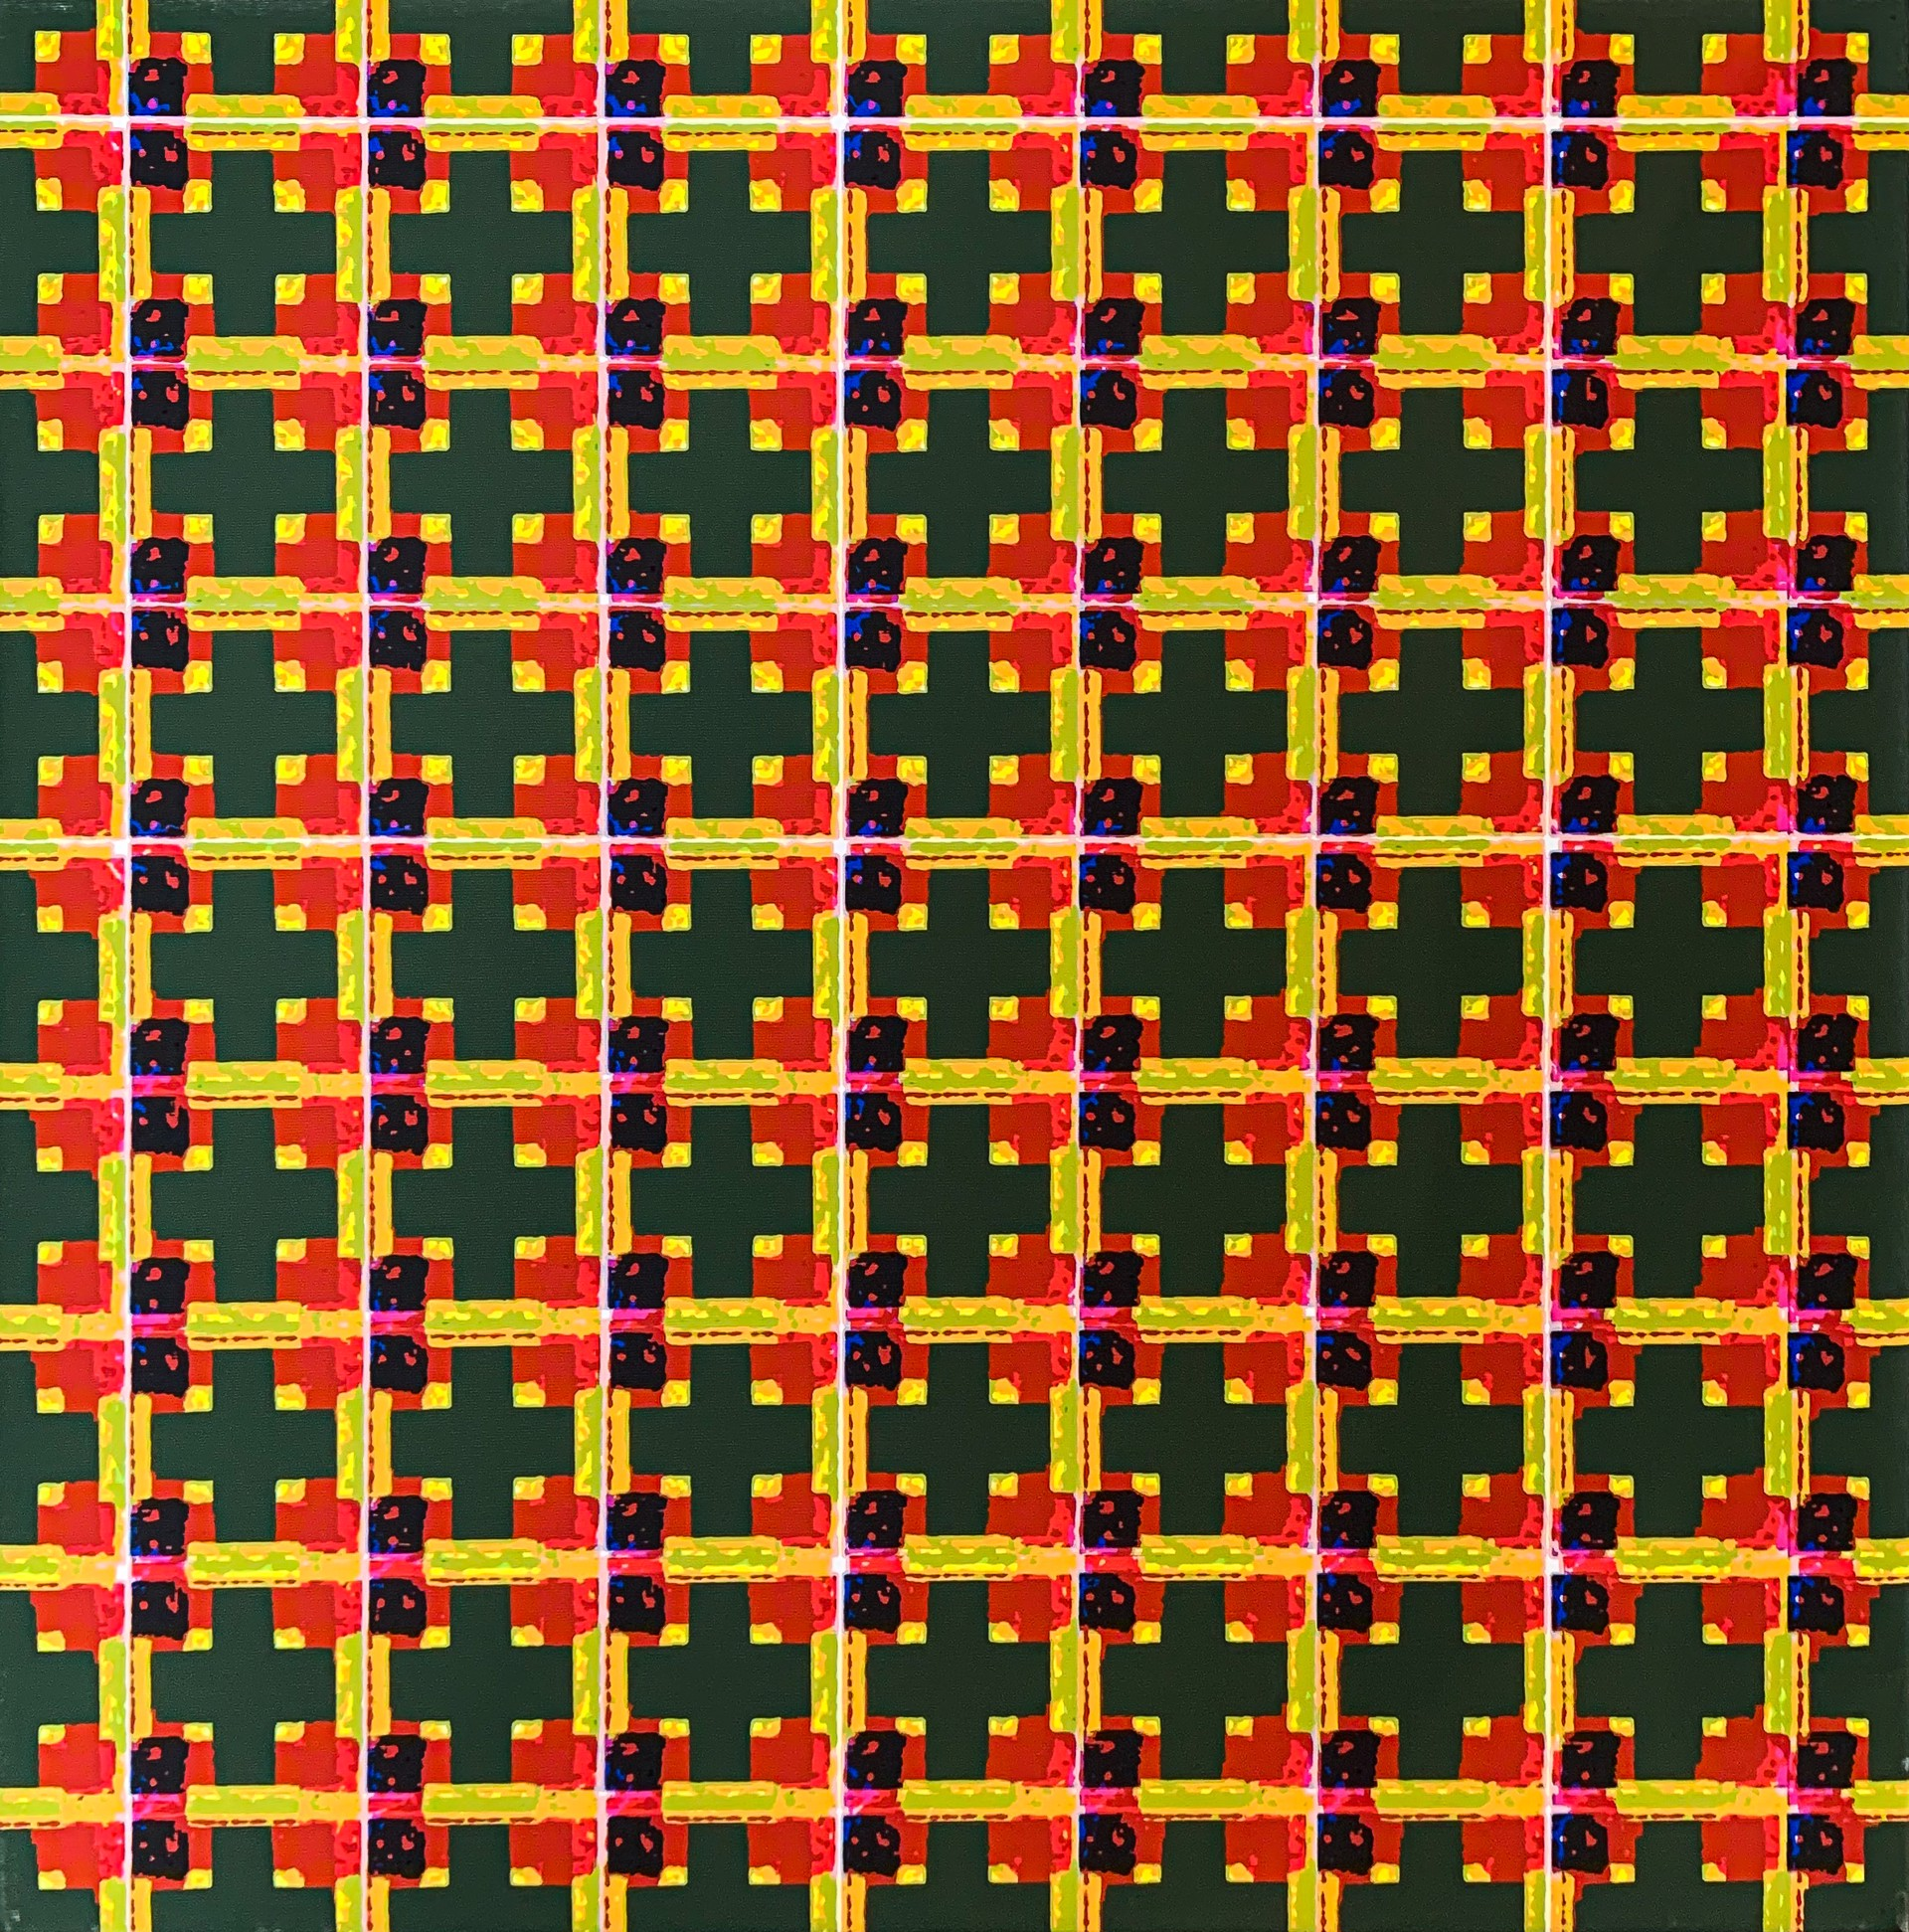 Green Cross Grid by David Miller